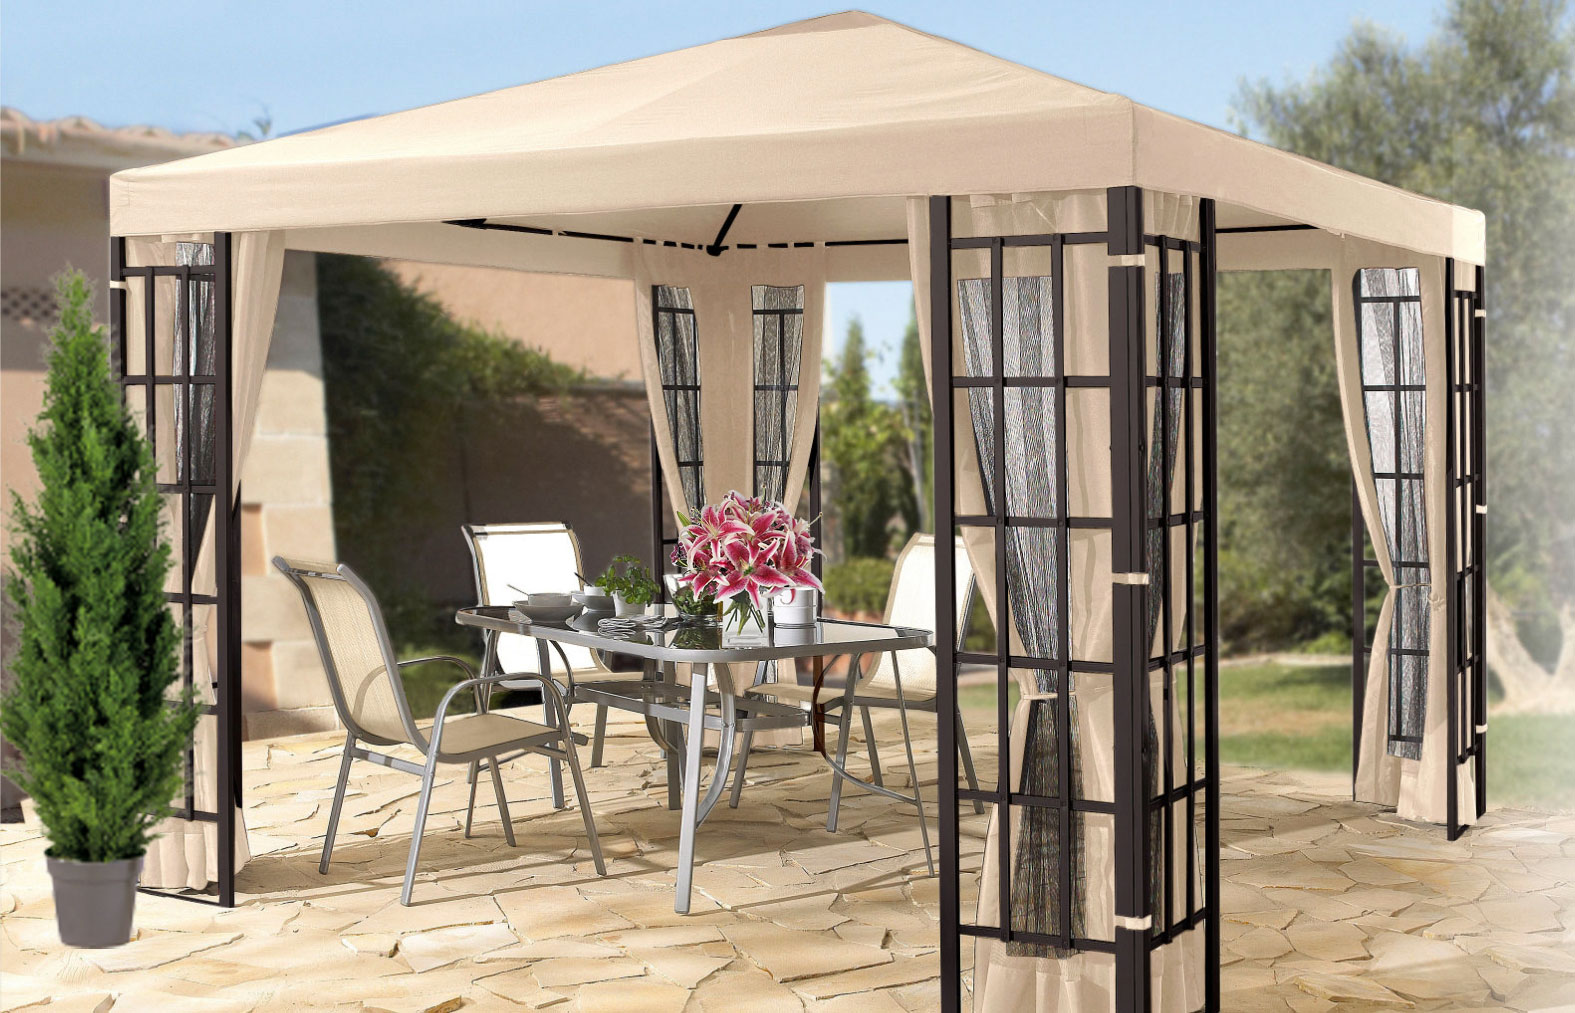 pavillonseiten seitenteile fenster polyester natur 3x3m. Black Bedroom Furniture Sets. Home Design Ideas